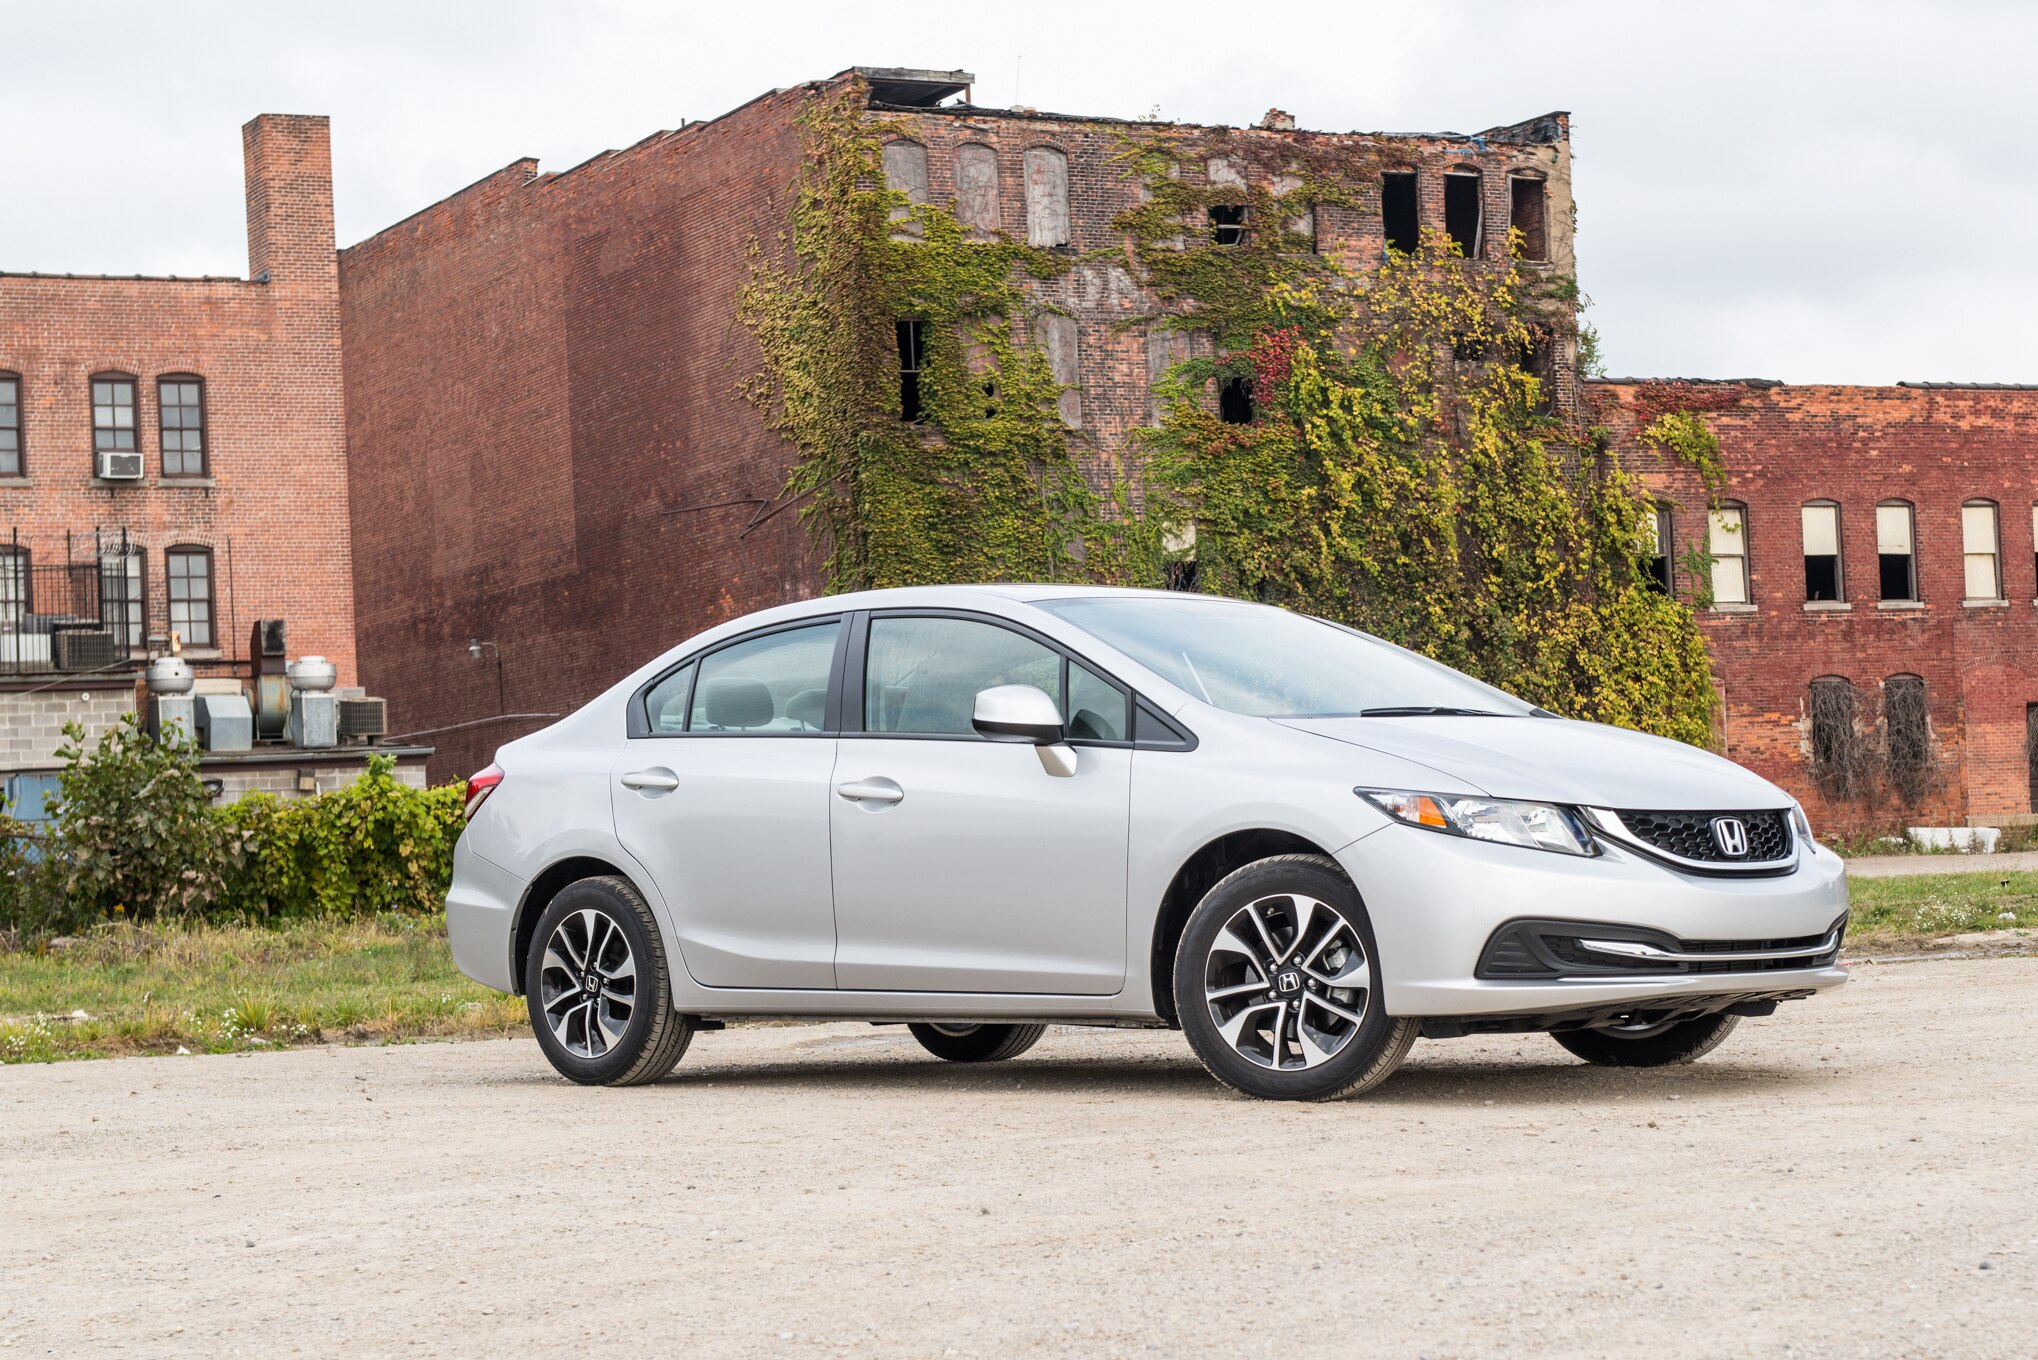 2014 Honda Civic EX Front Three Quarters View